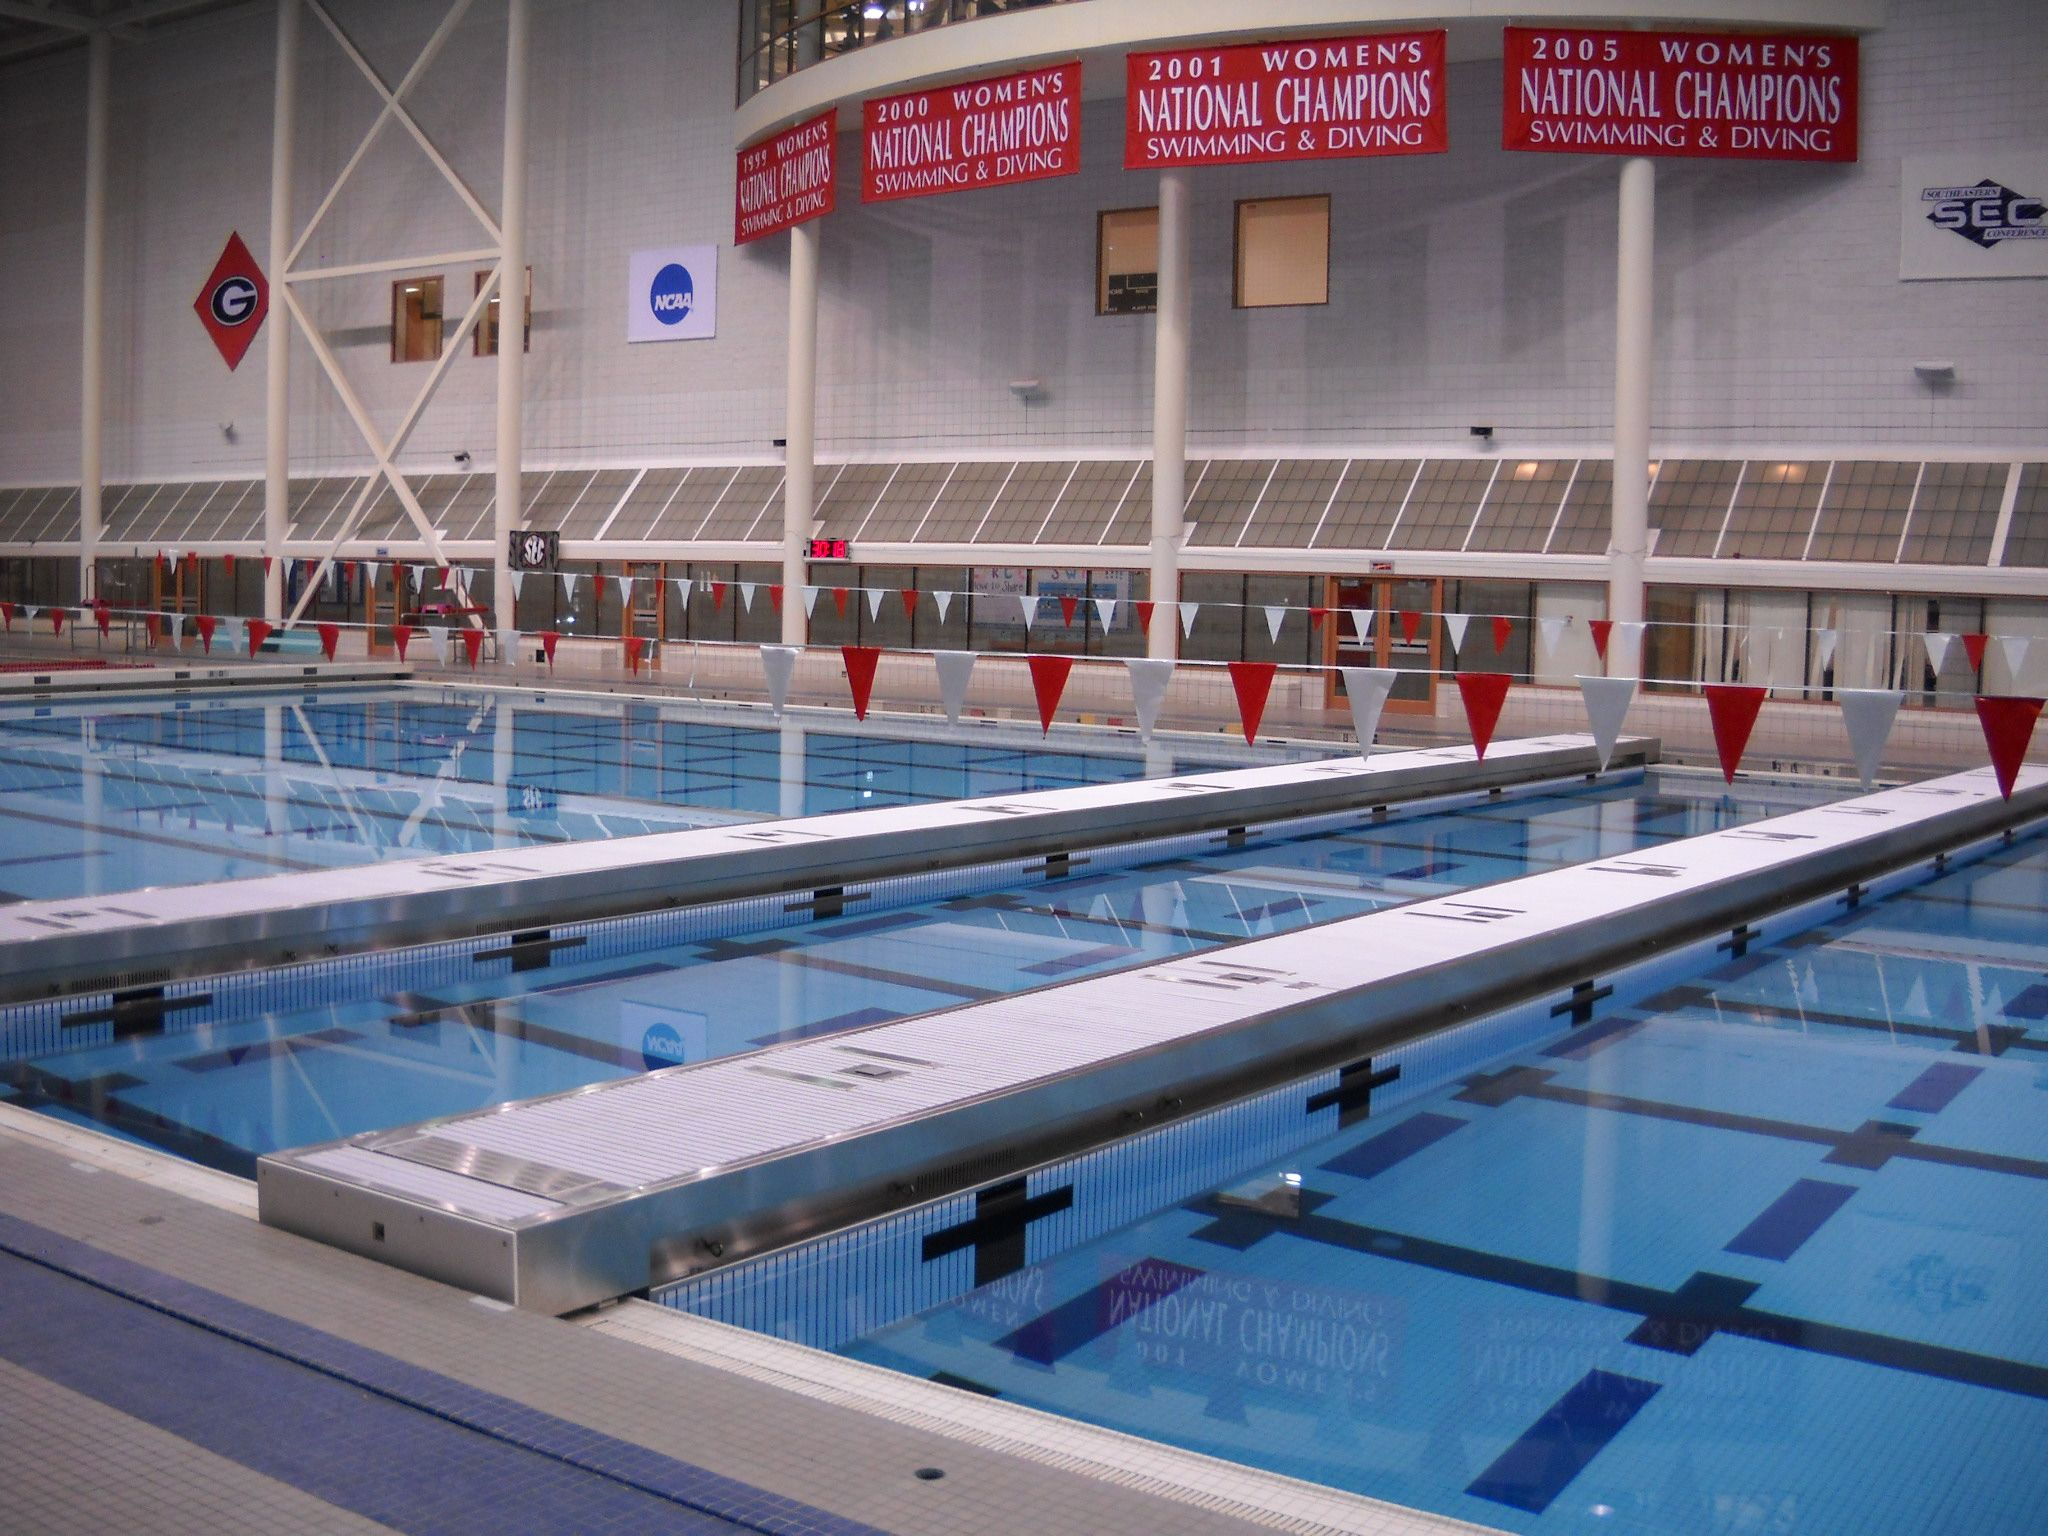 Swimming Pool Bulkheads At University Of Georgia Gabrielsen Natatorium Pool Swimming Champions Swimming Diving